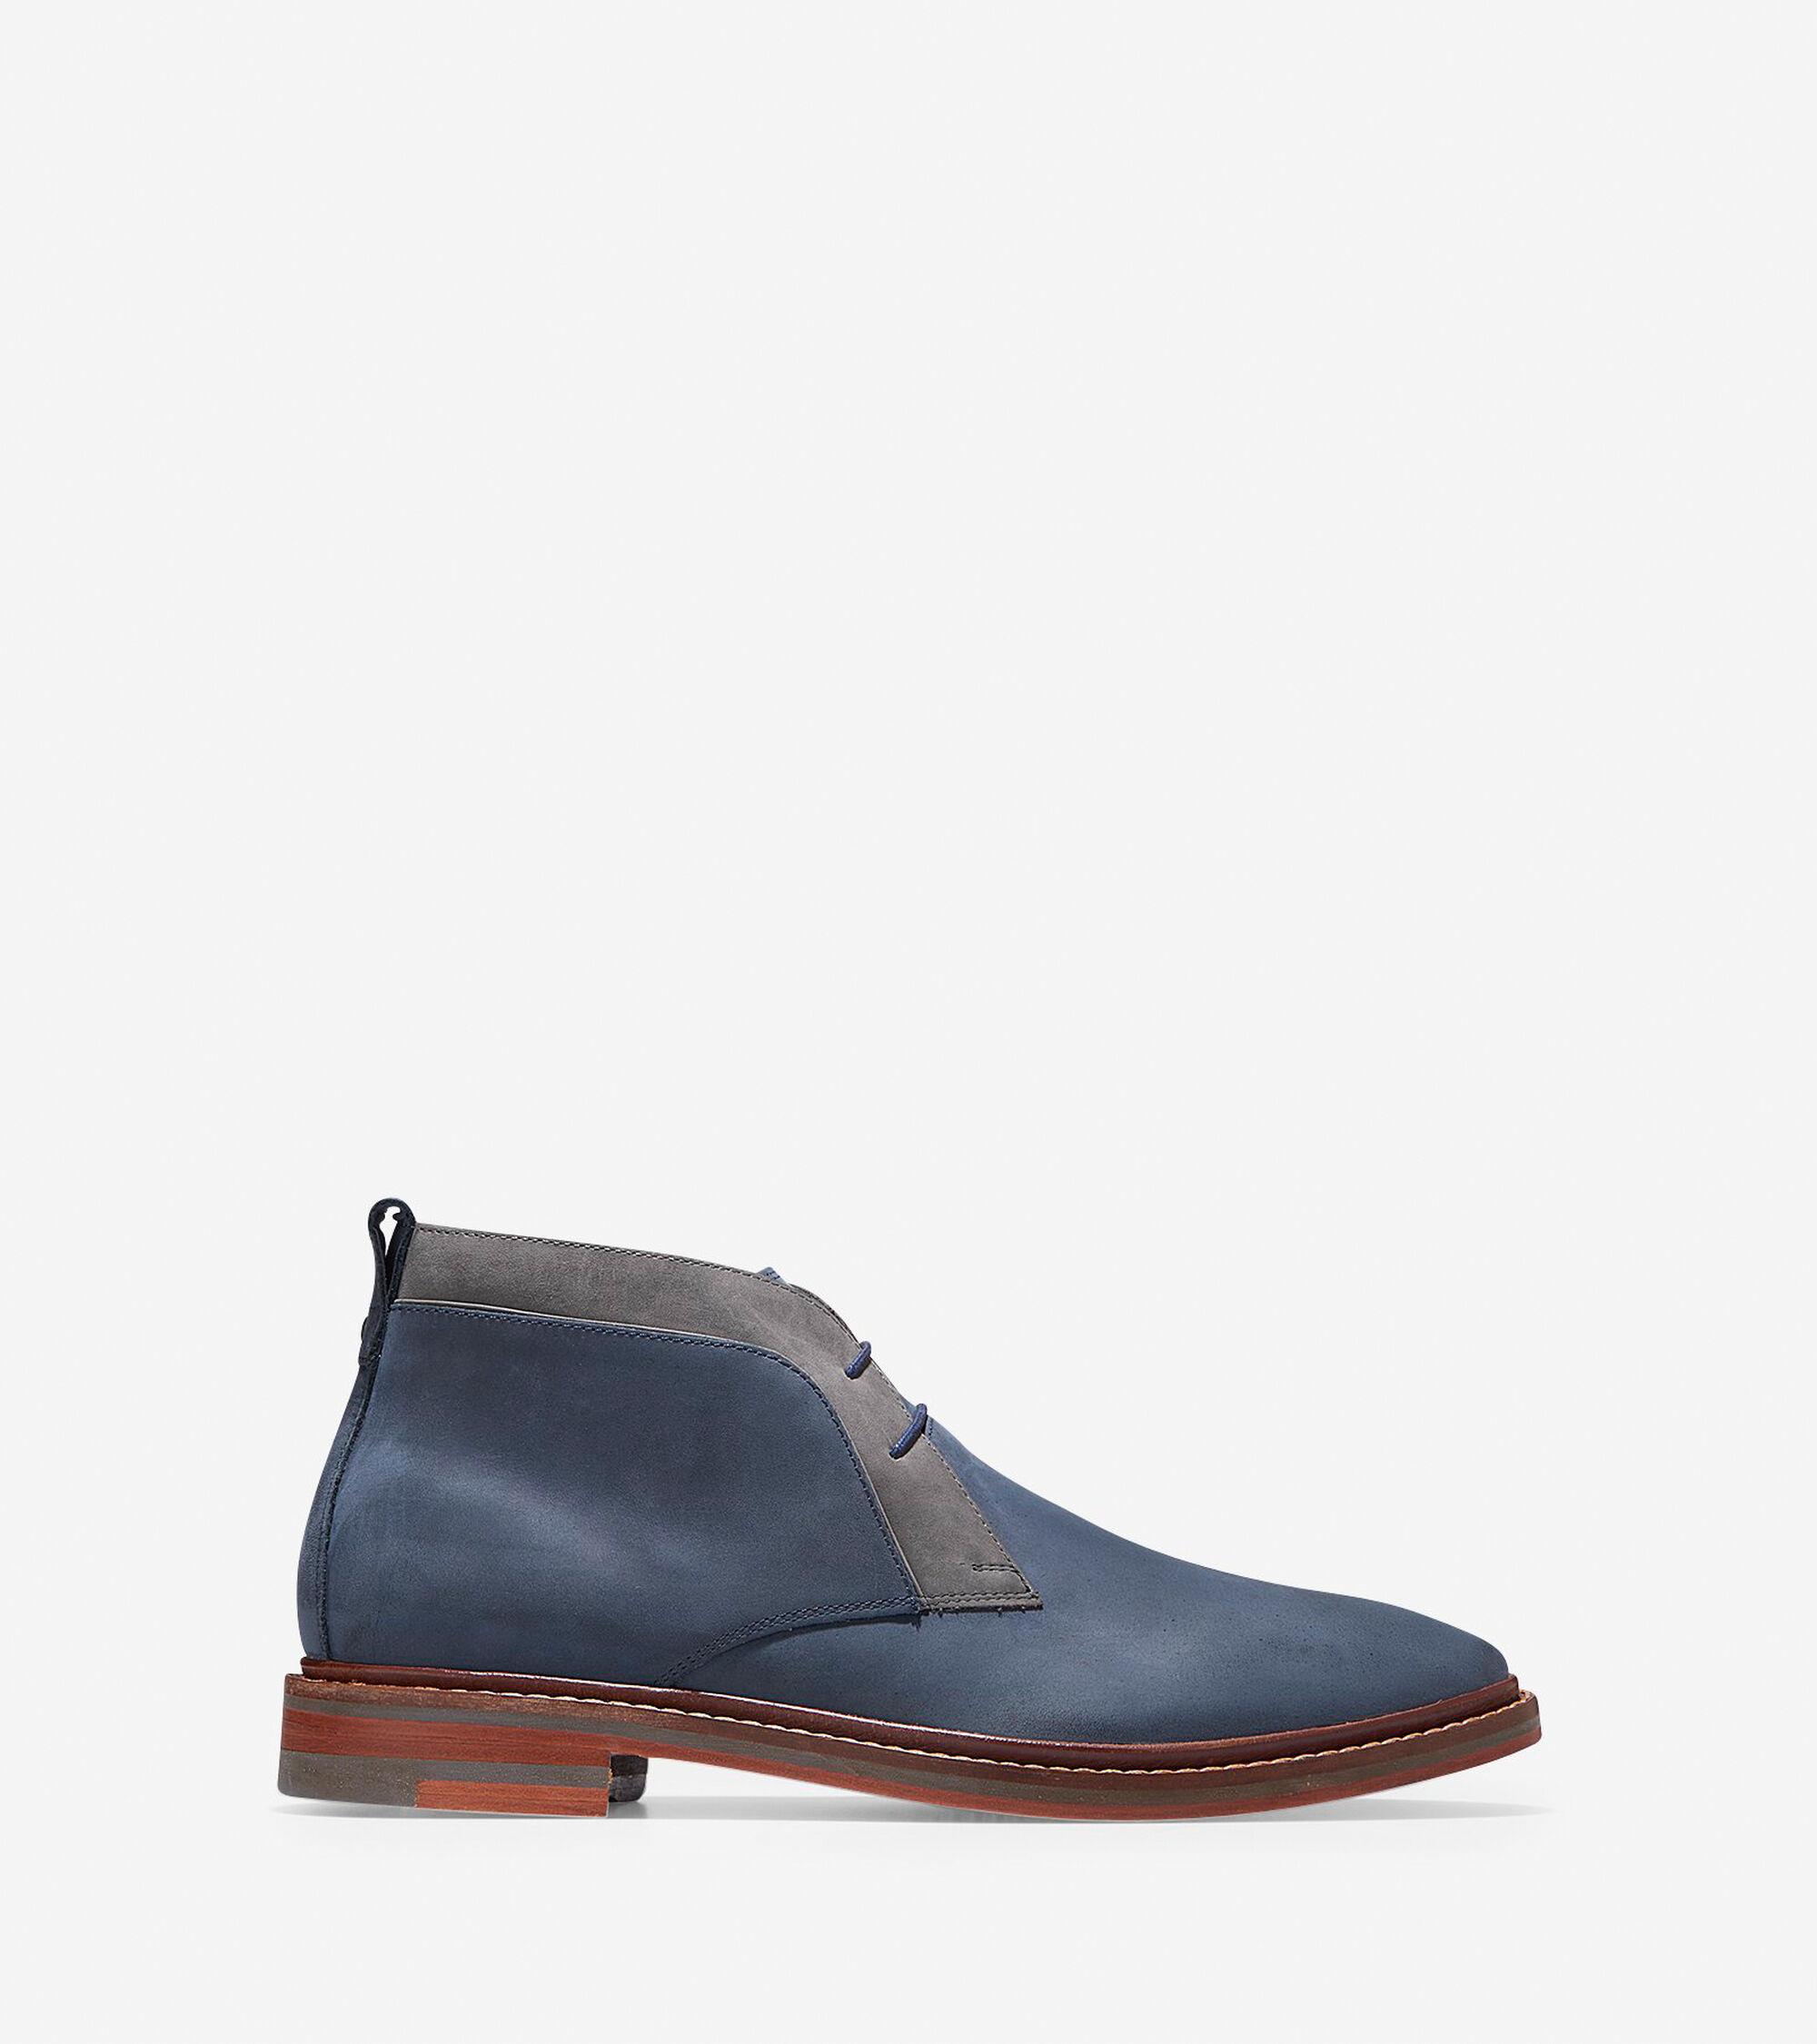 Shoes > Cambridge Water Resistant Chukka